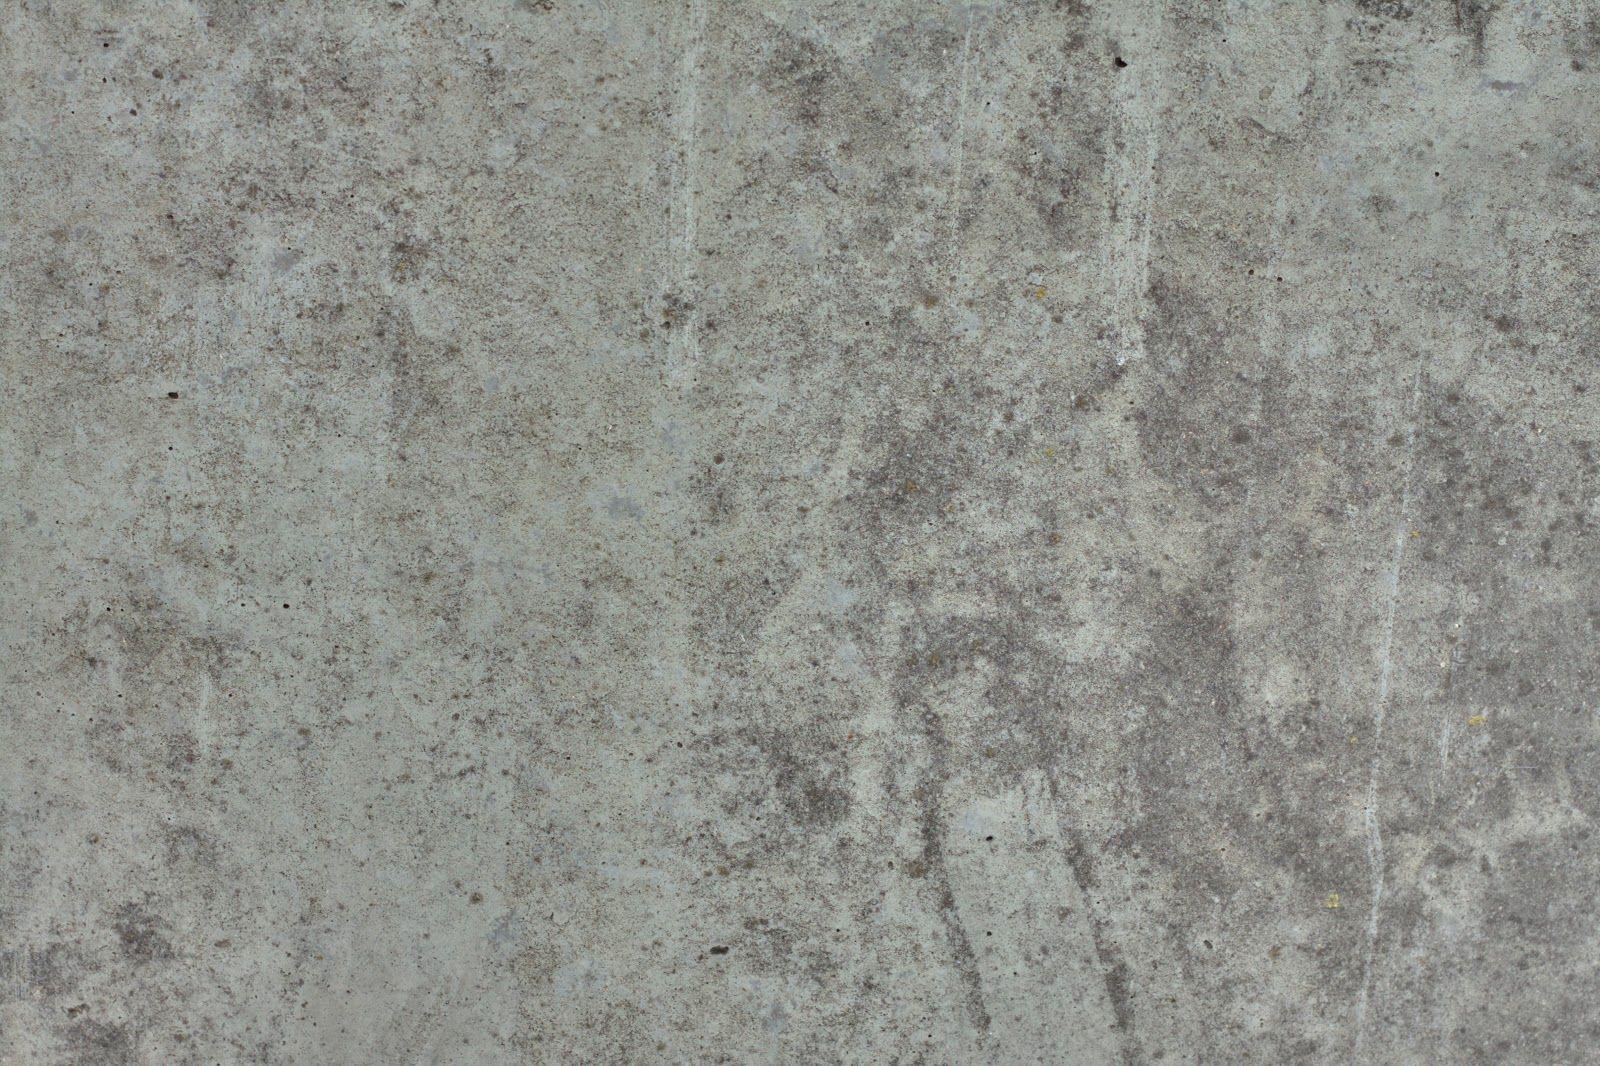 Concrete Granite Wall Smooth Dirt Pillar Texture Ver 6 Concrete Texture Dirt Texture Smooth Concrete